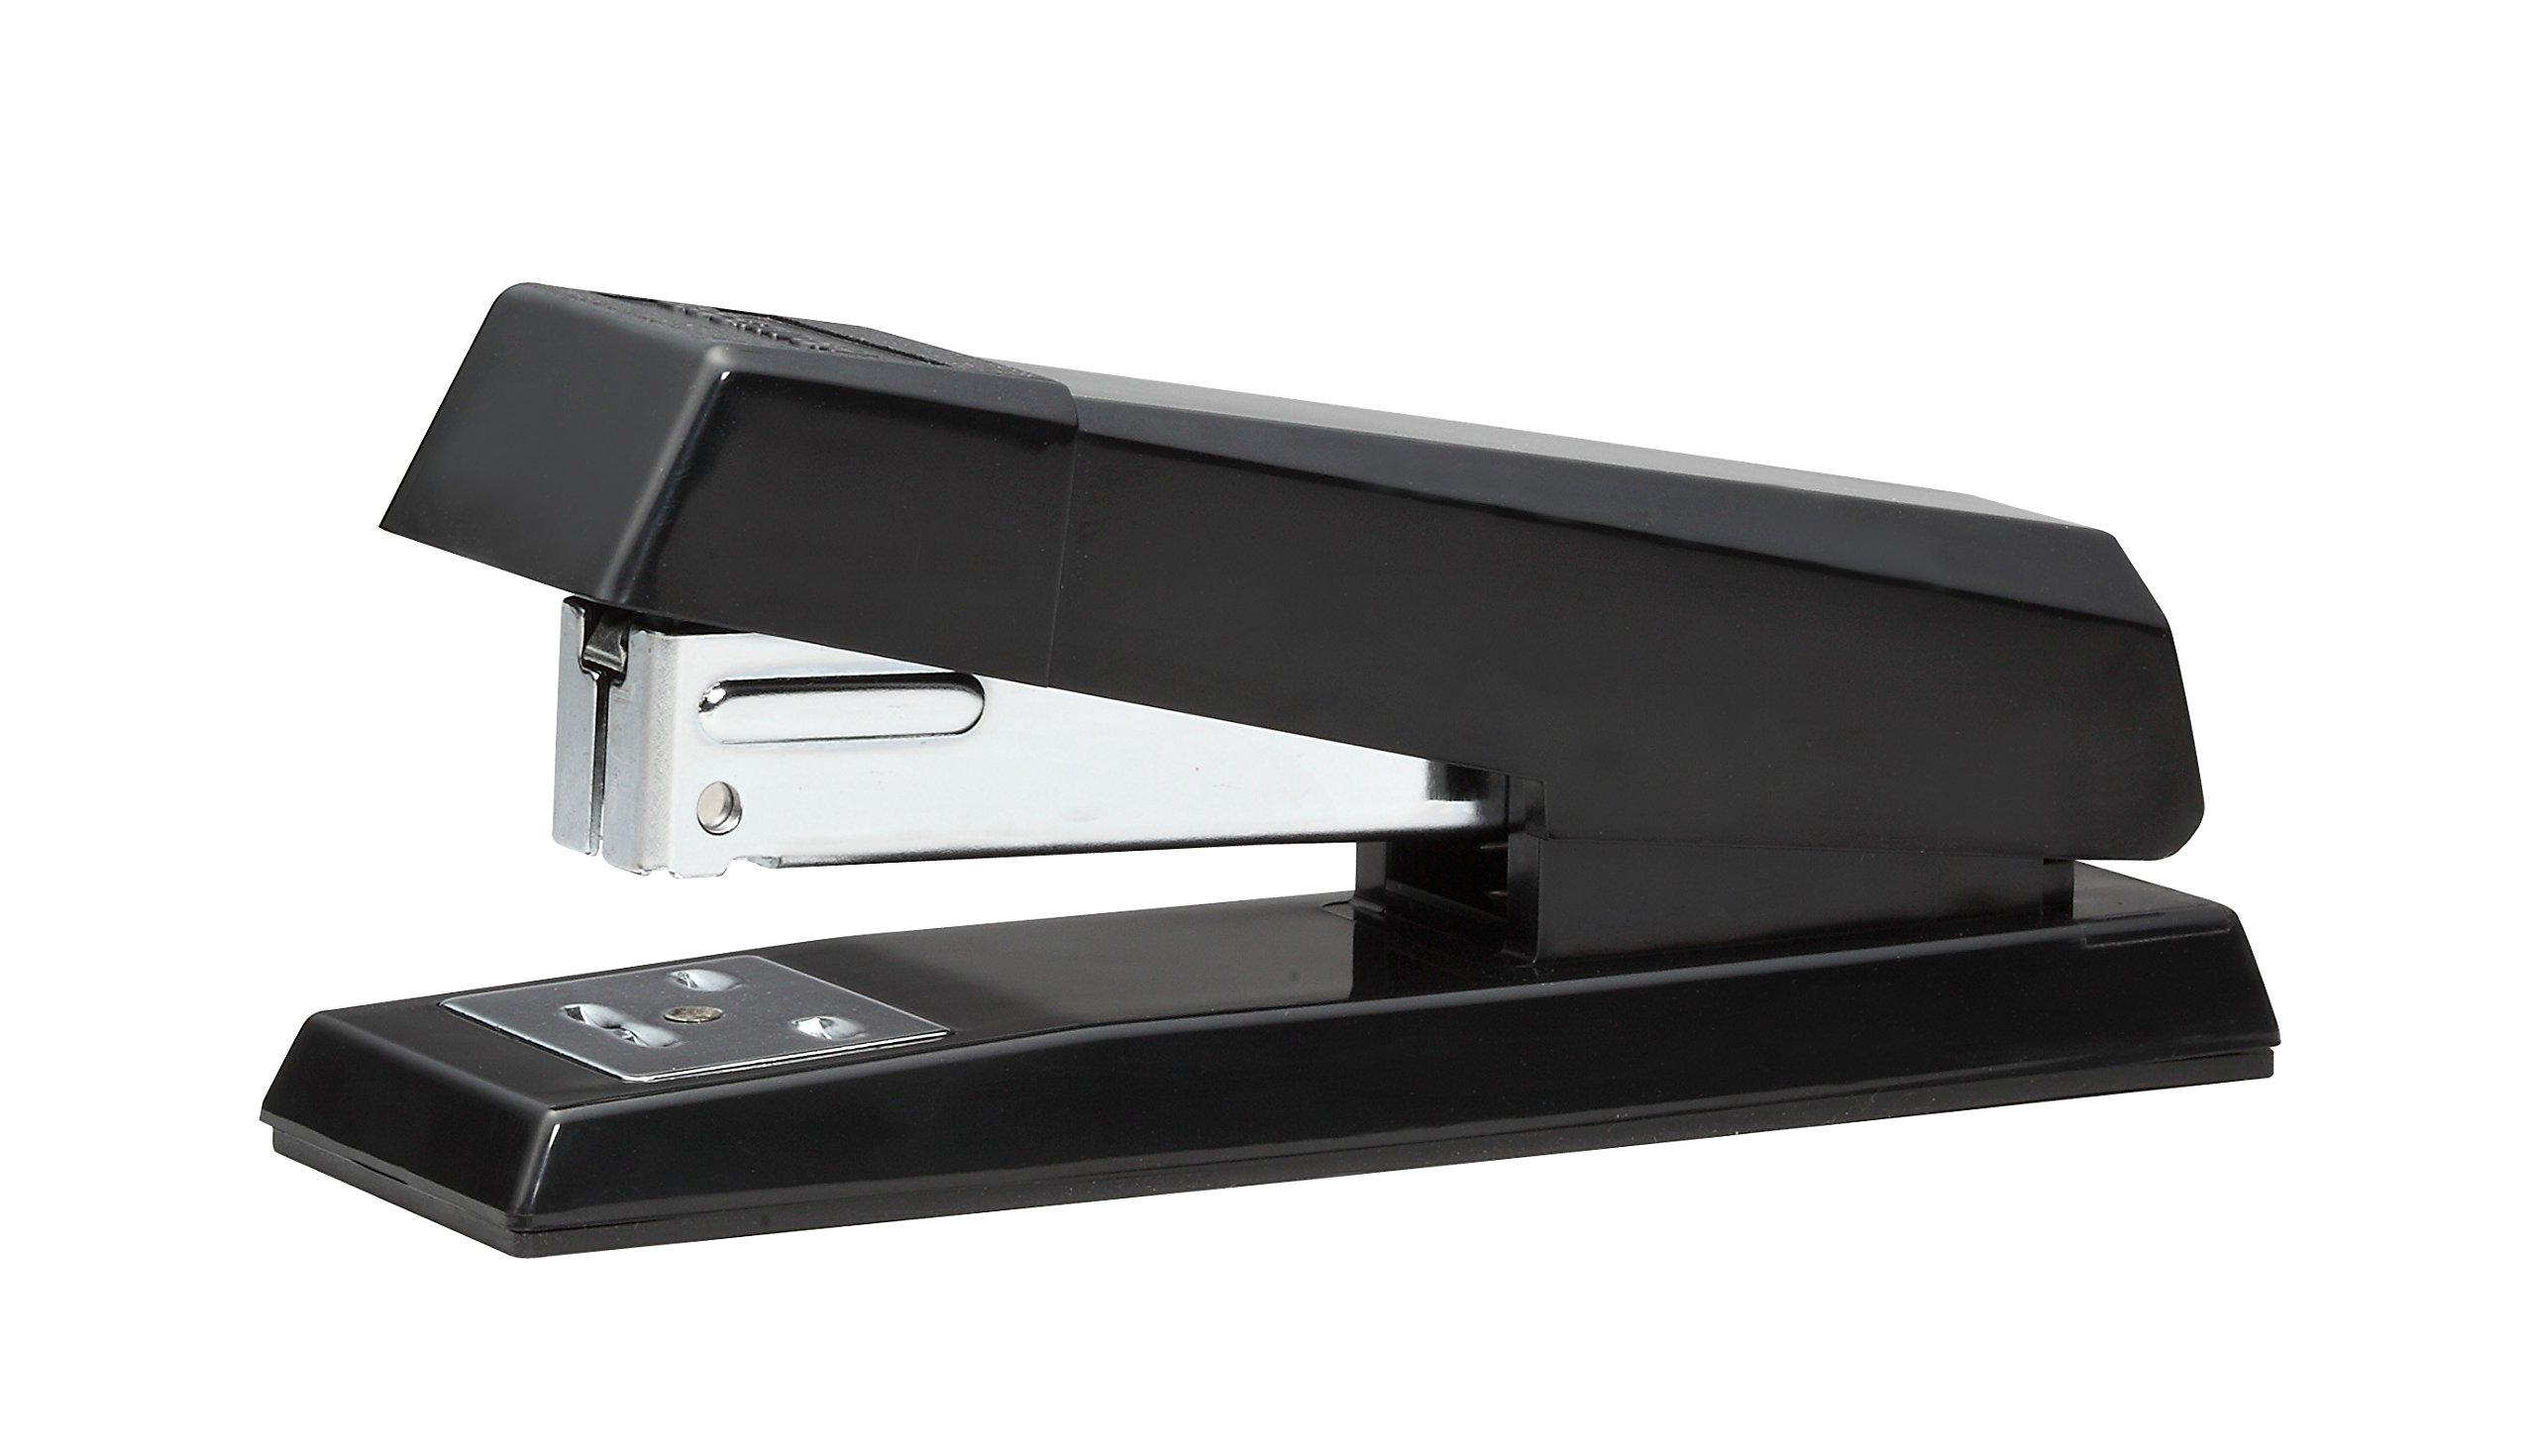 Bostitch No-Jam Premium Half-Strip Desktop Stapler, 20 Sheets, Black